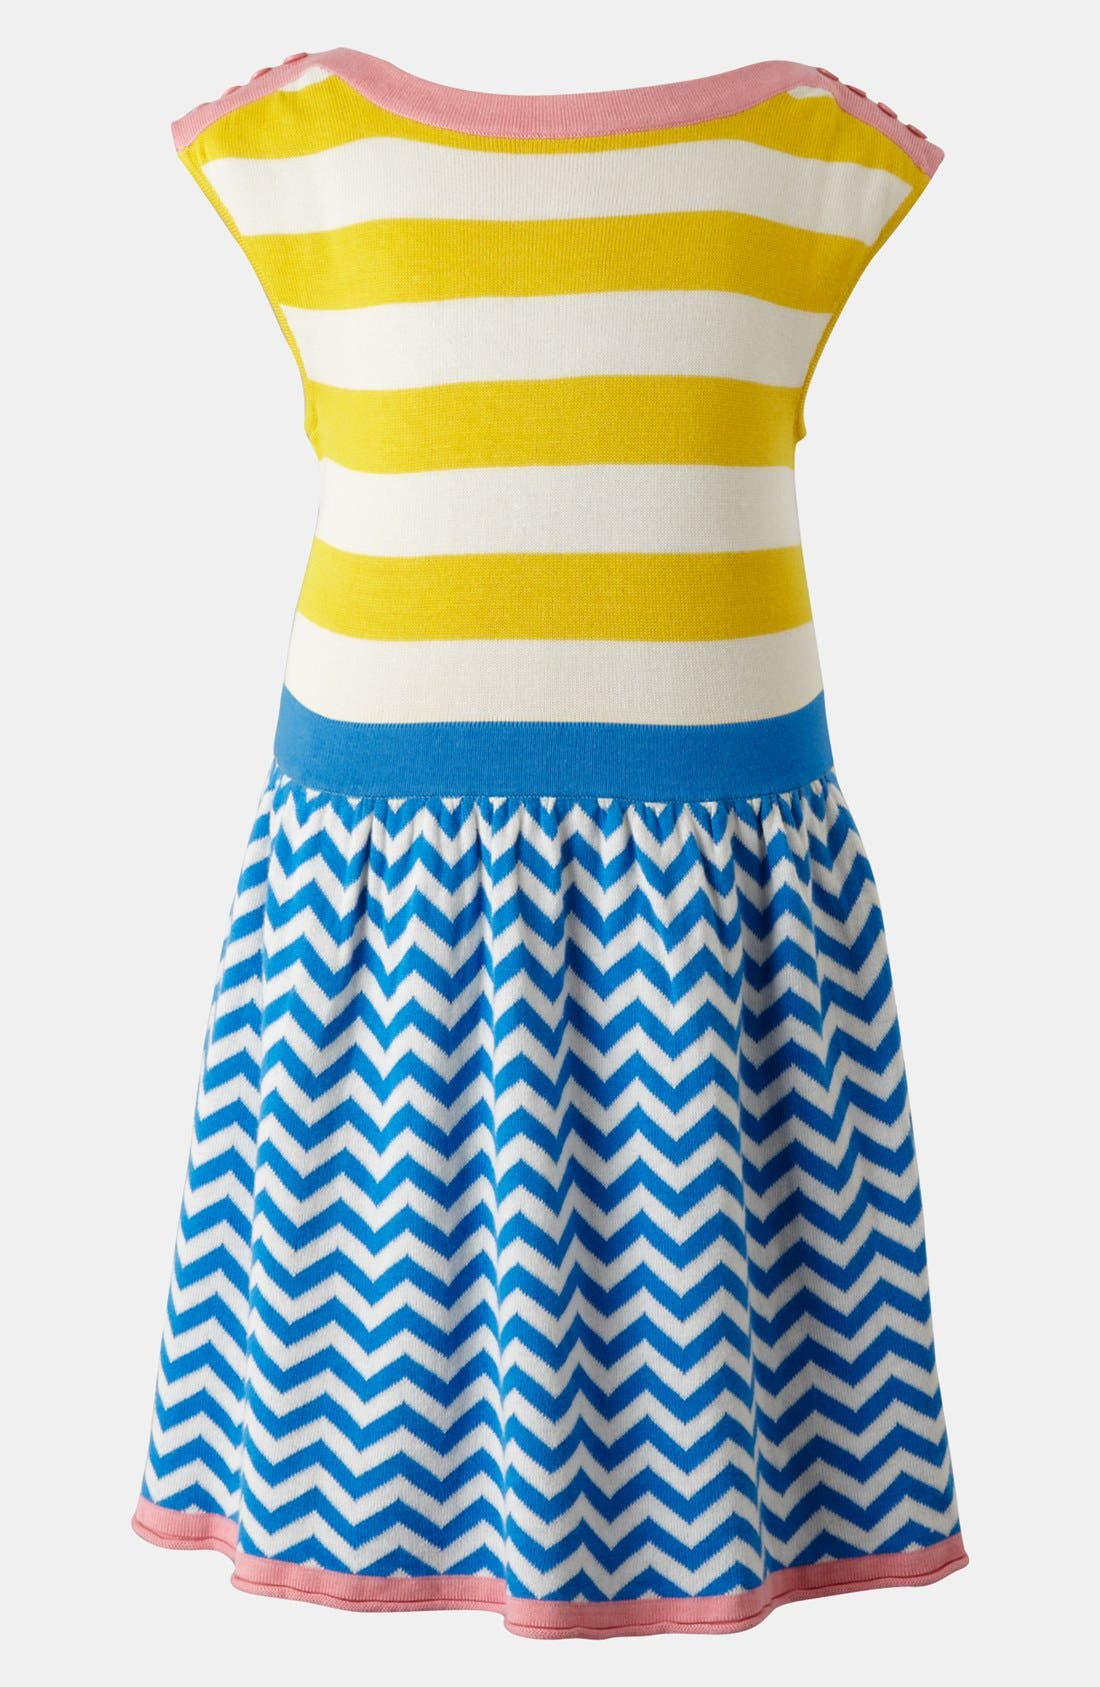 Alternate Image 1 Selected - Mini Boden 'Colorful Summer' Knit Dress (Toddler)